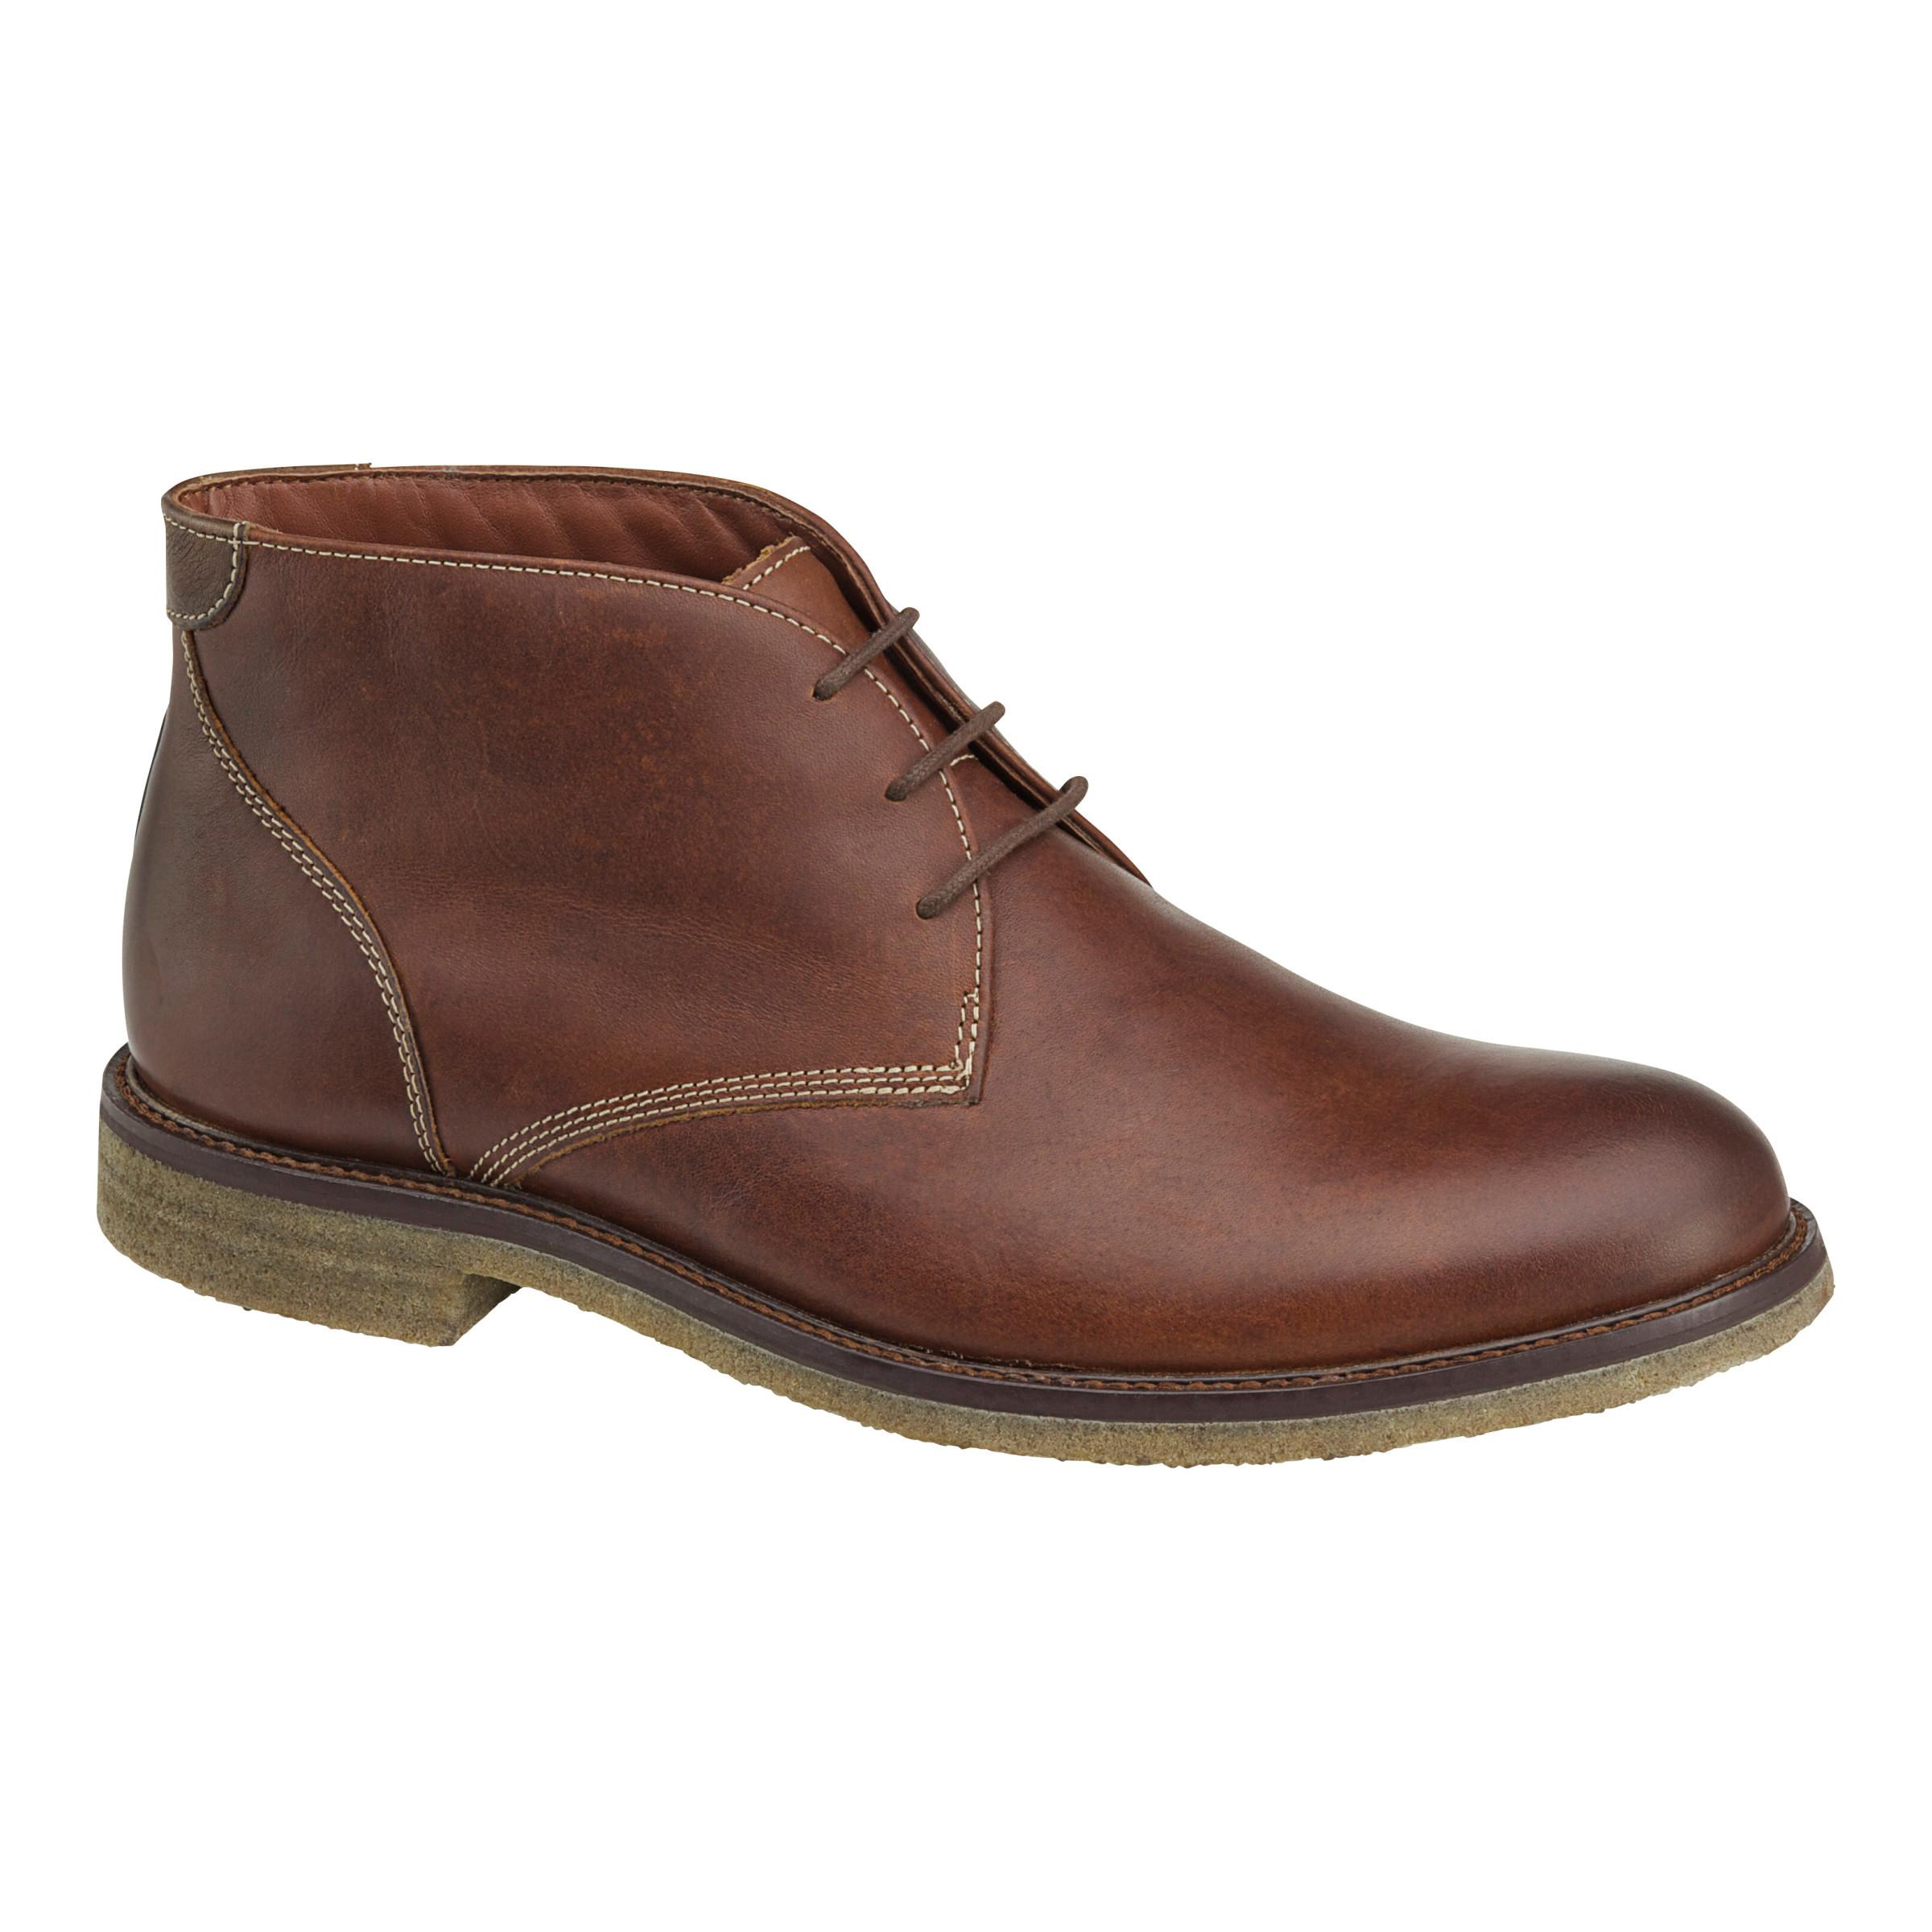 copeland-chukka-red-brown-252022